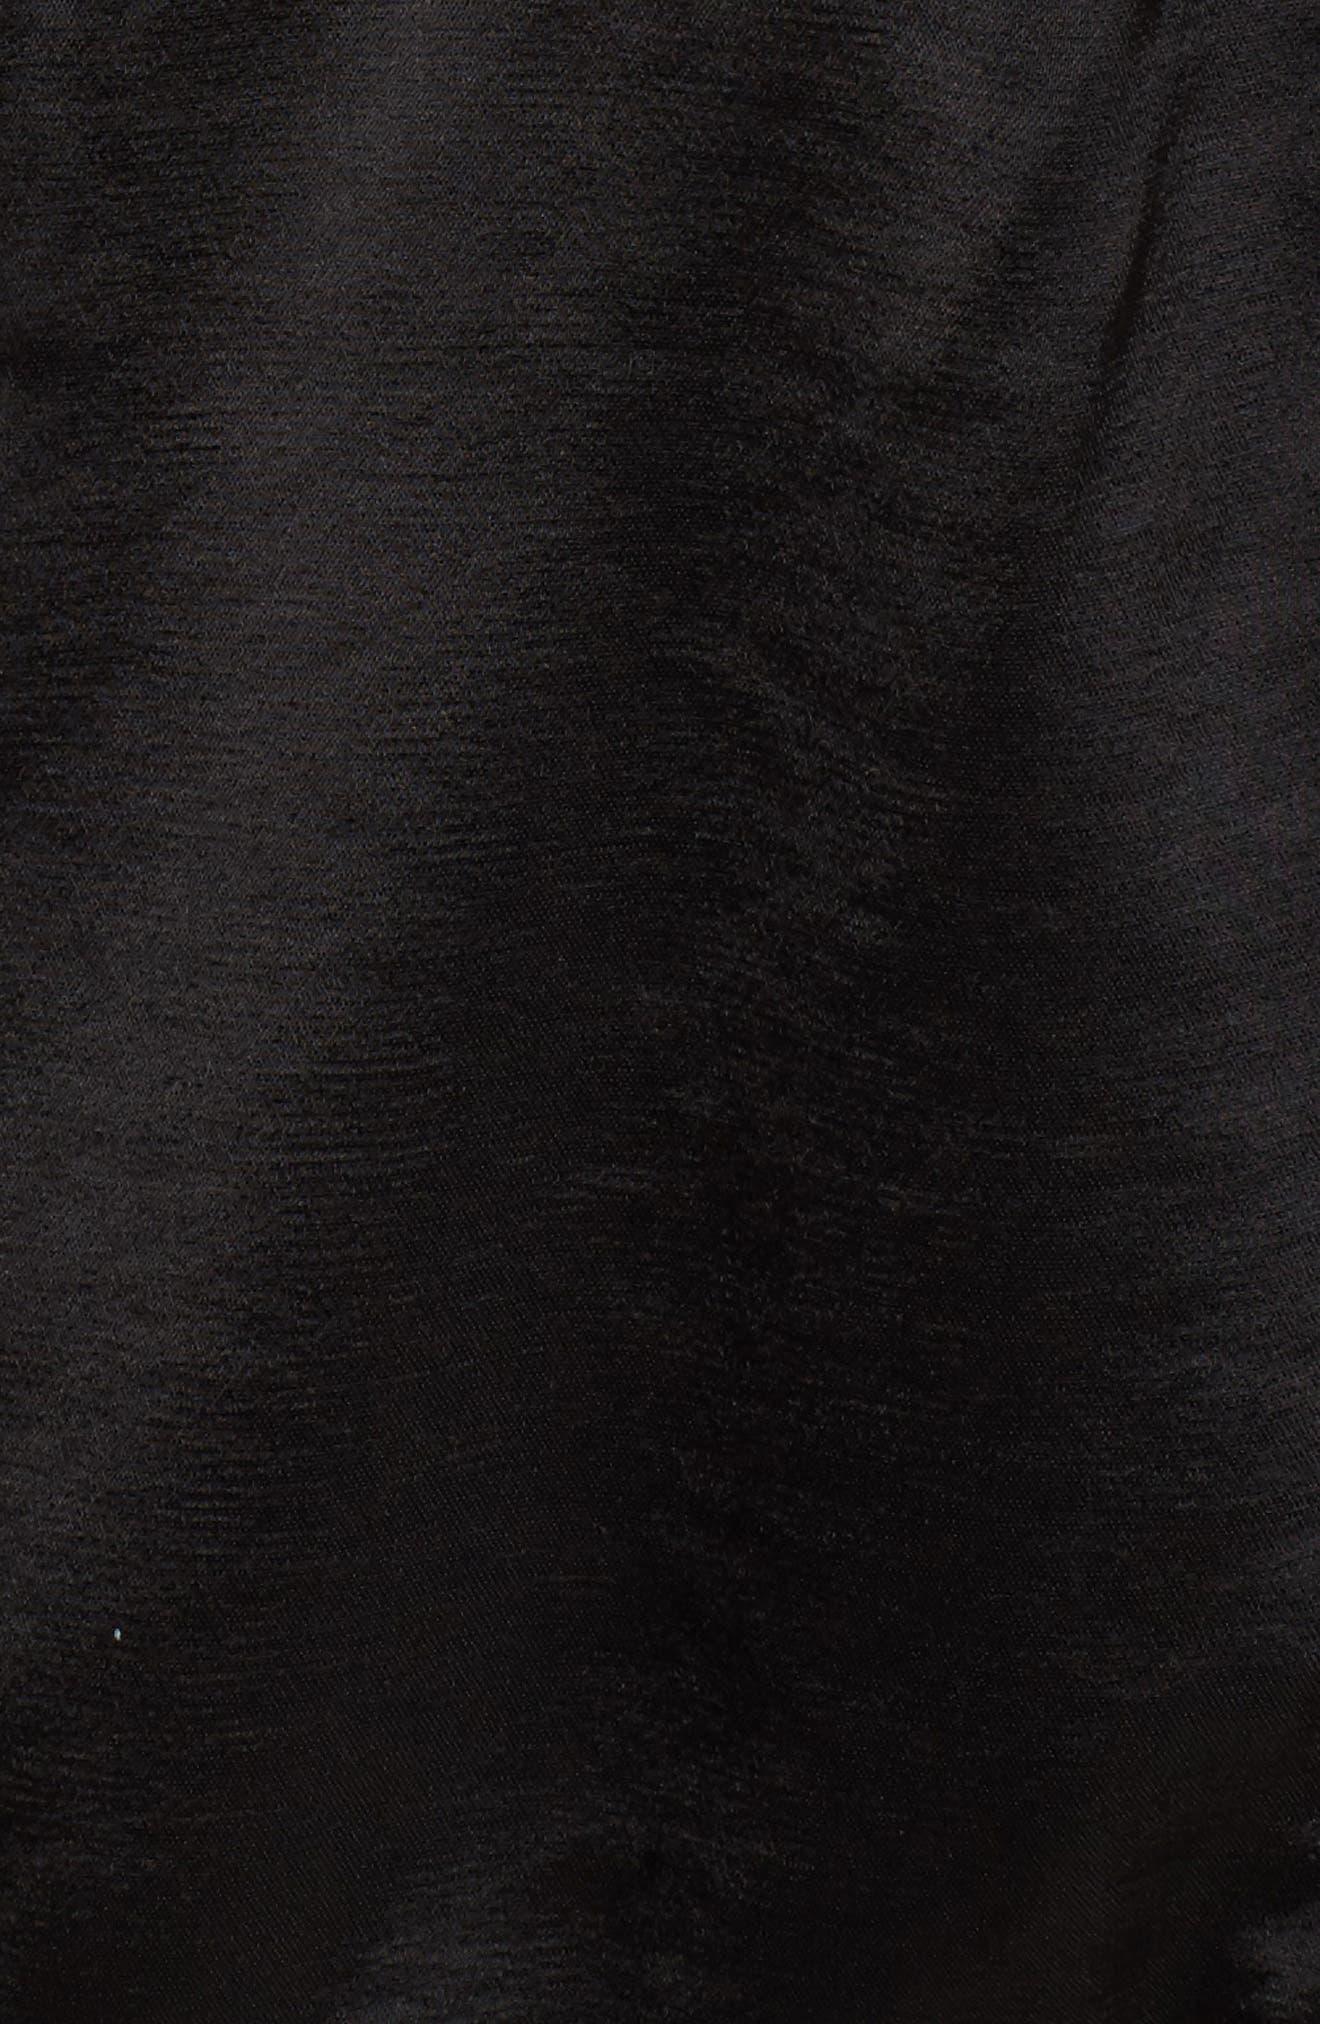 Satin Track Jacket,                             Alternate thumbnail 5, color,                             Black